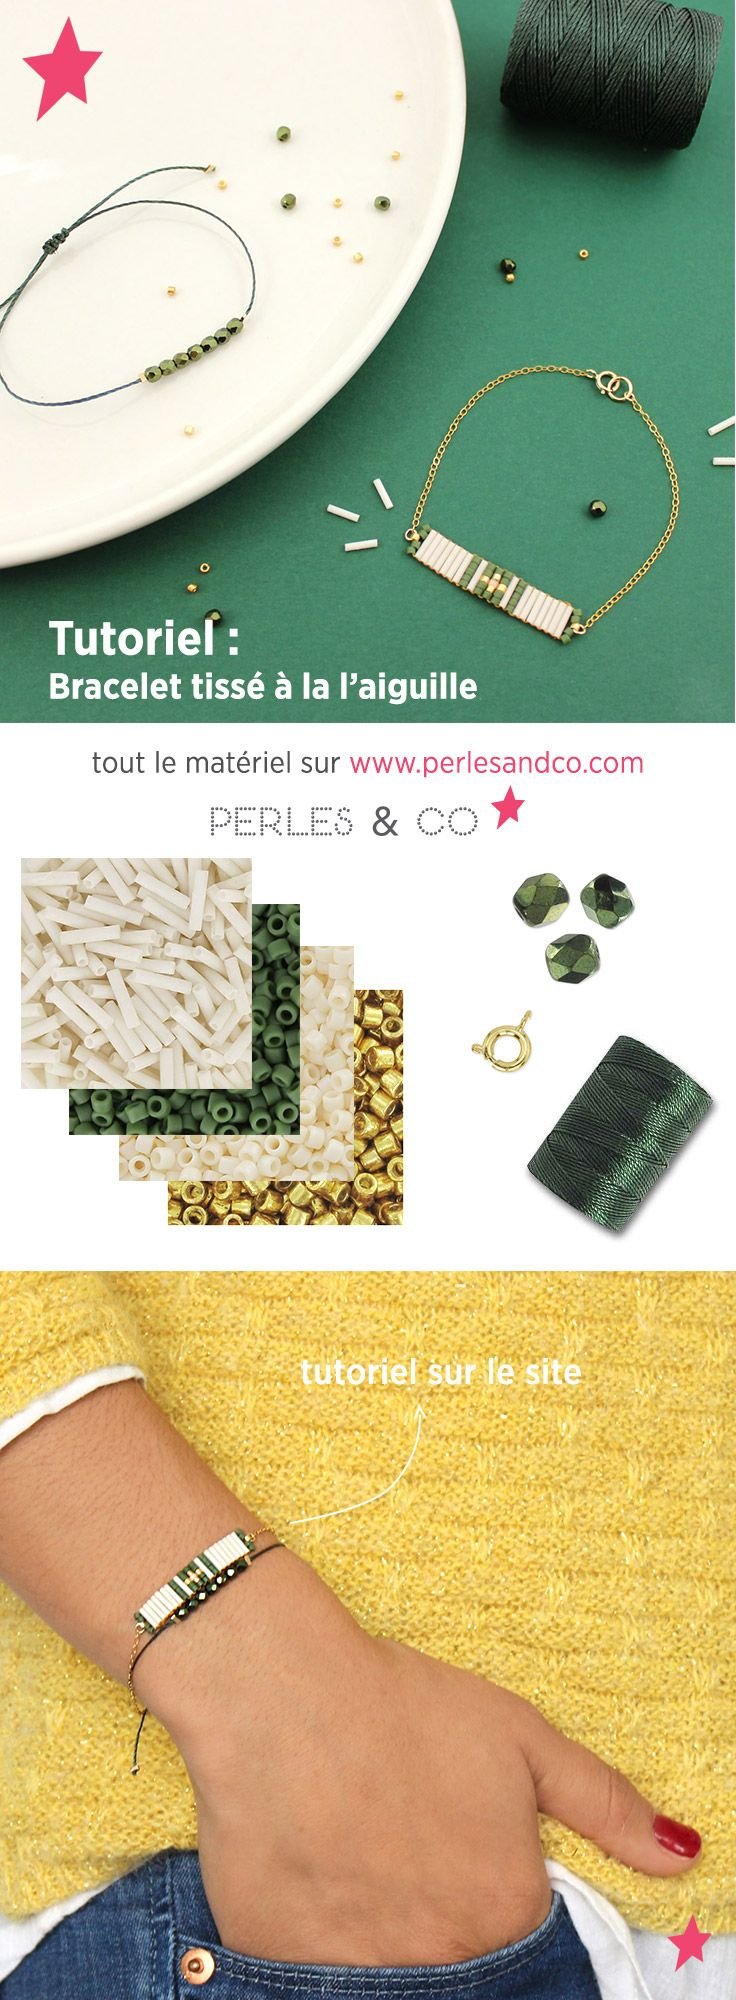 bracelet perle tisse sans metier a tisser